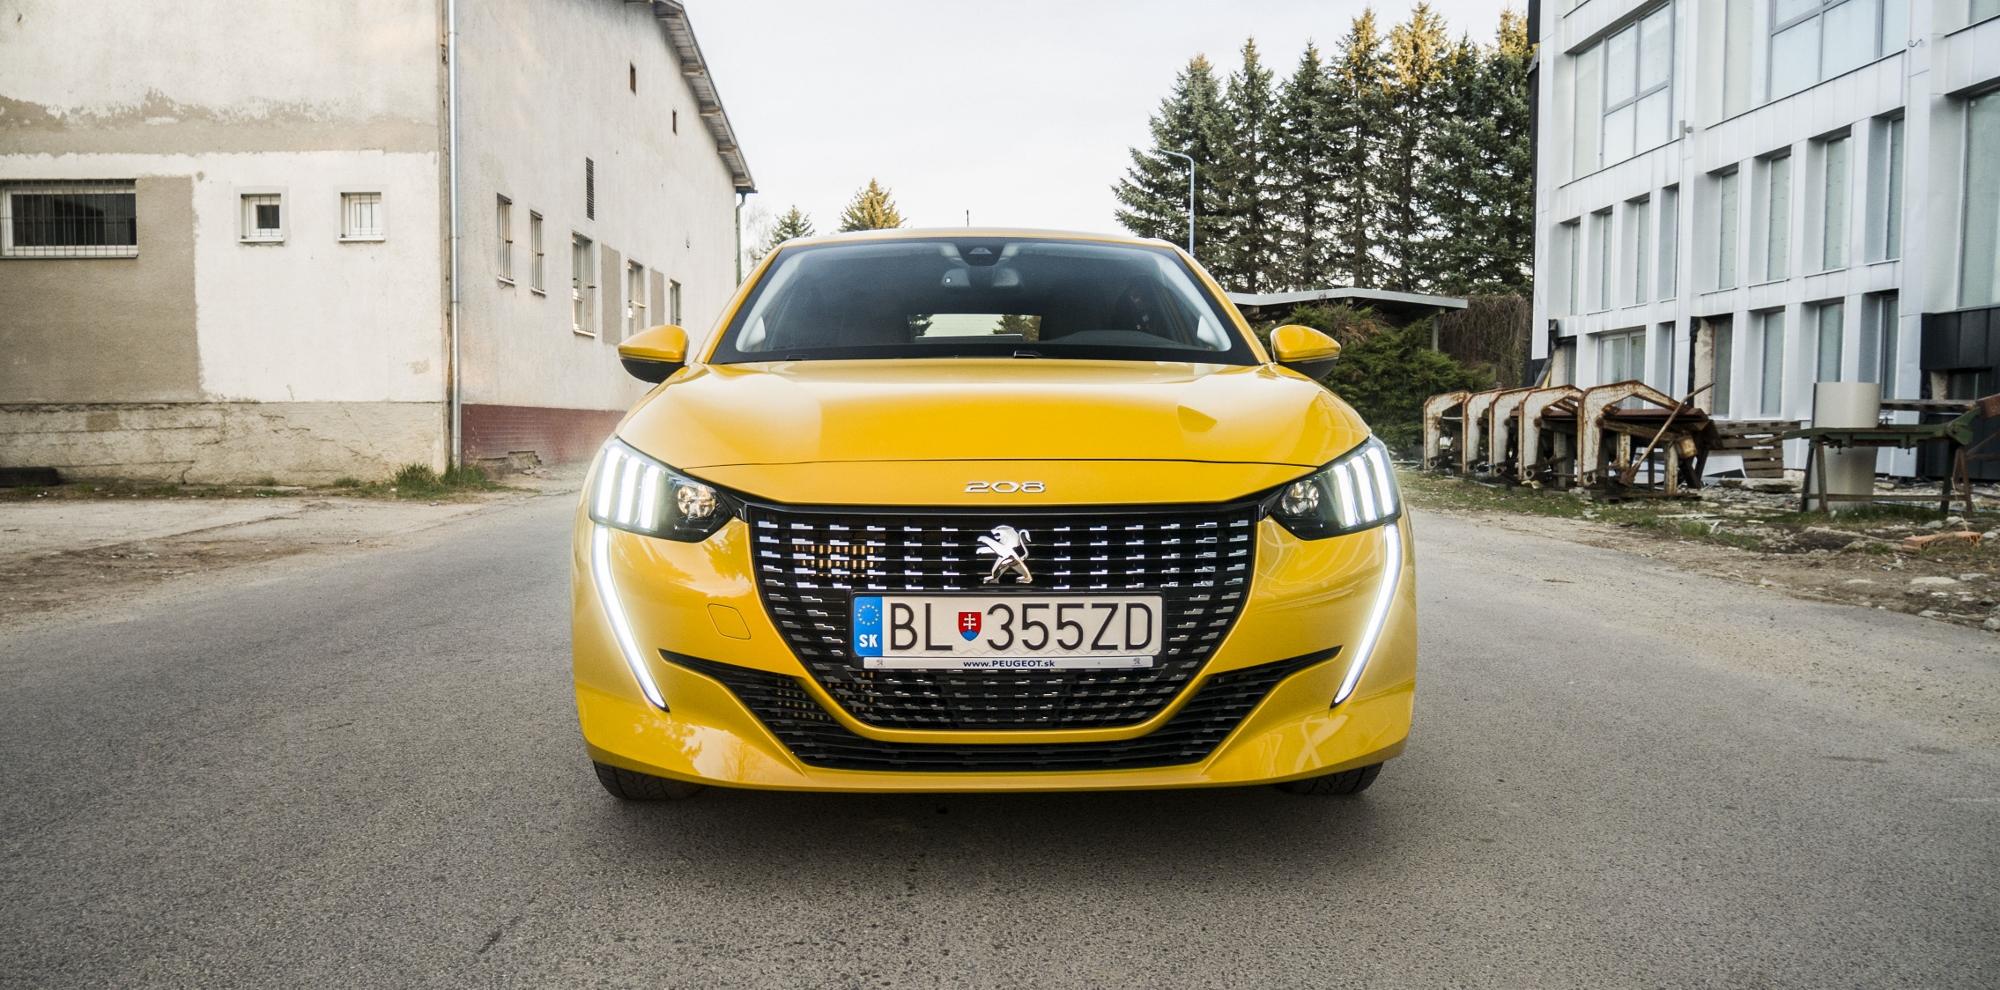 Test: Peugeot 208 prekvapivo pútal pohľady JLGxAL8oM7 peugeot-208-30